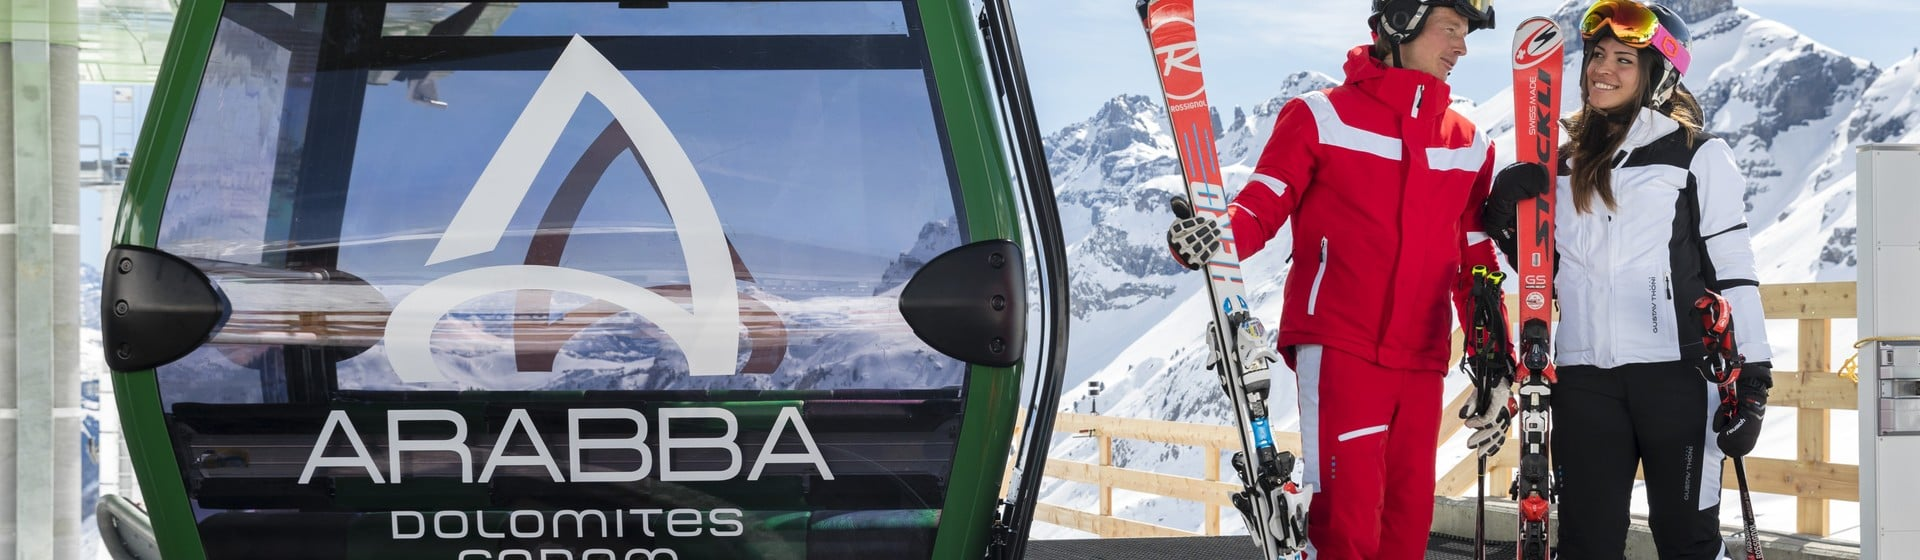 Novità Inverno 2020/2021 Ski Area Arabba - Marmolada